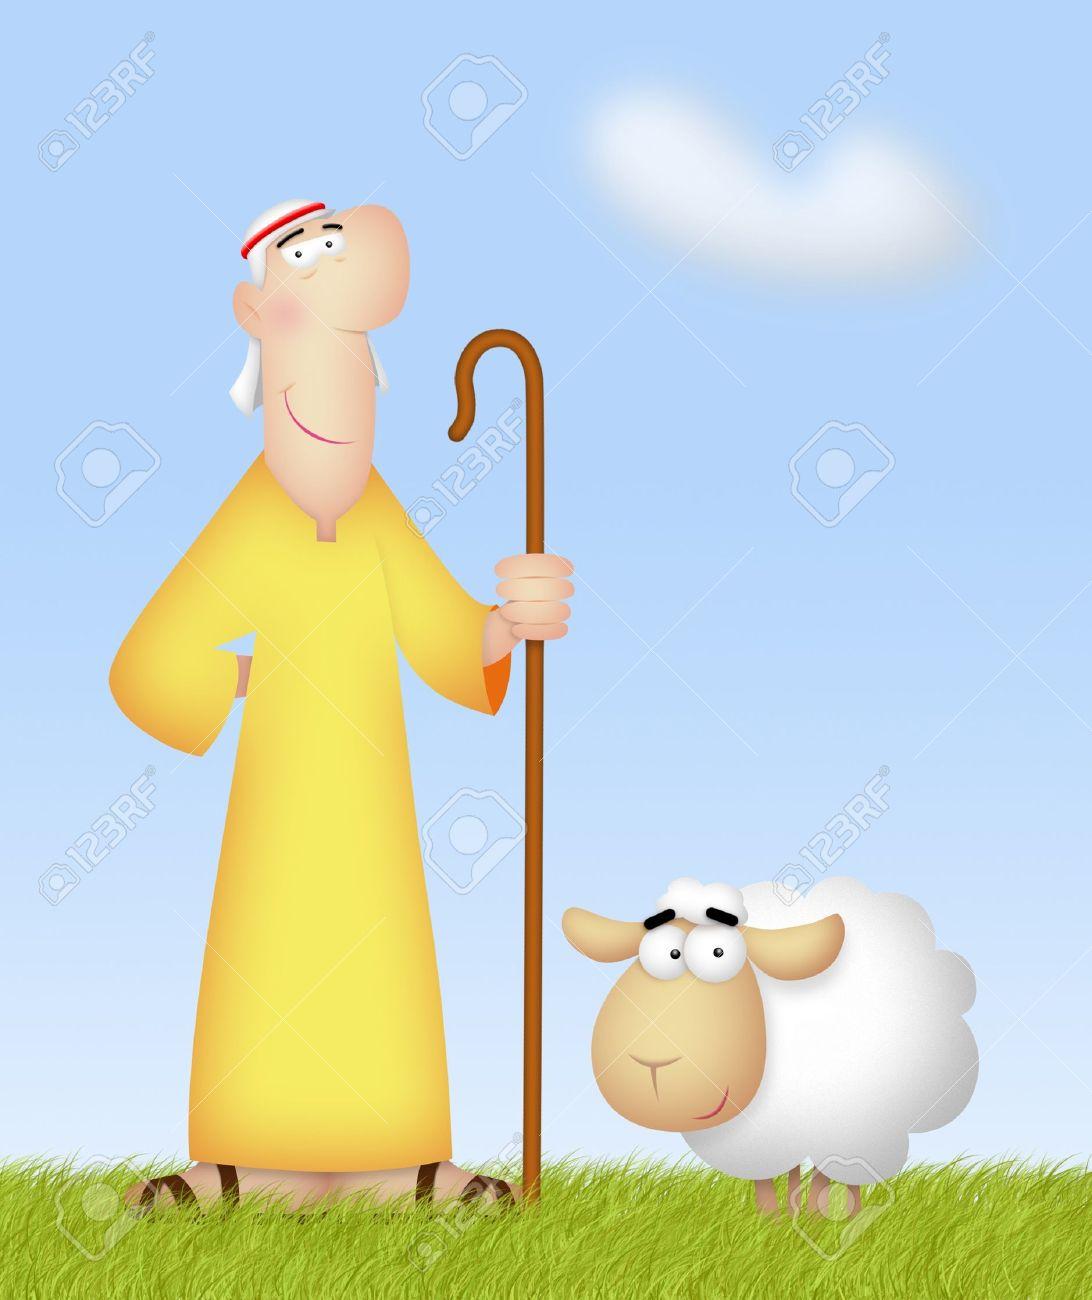 Shepherd with his cute sheep. - 20323400